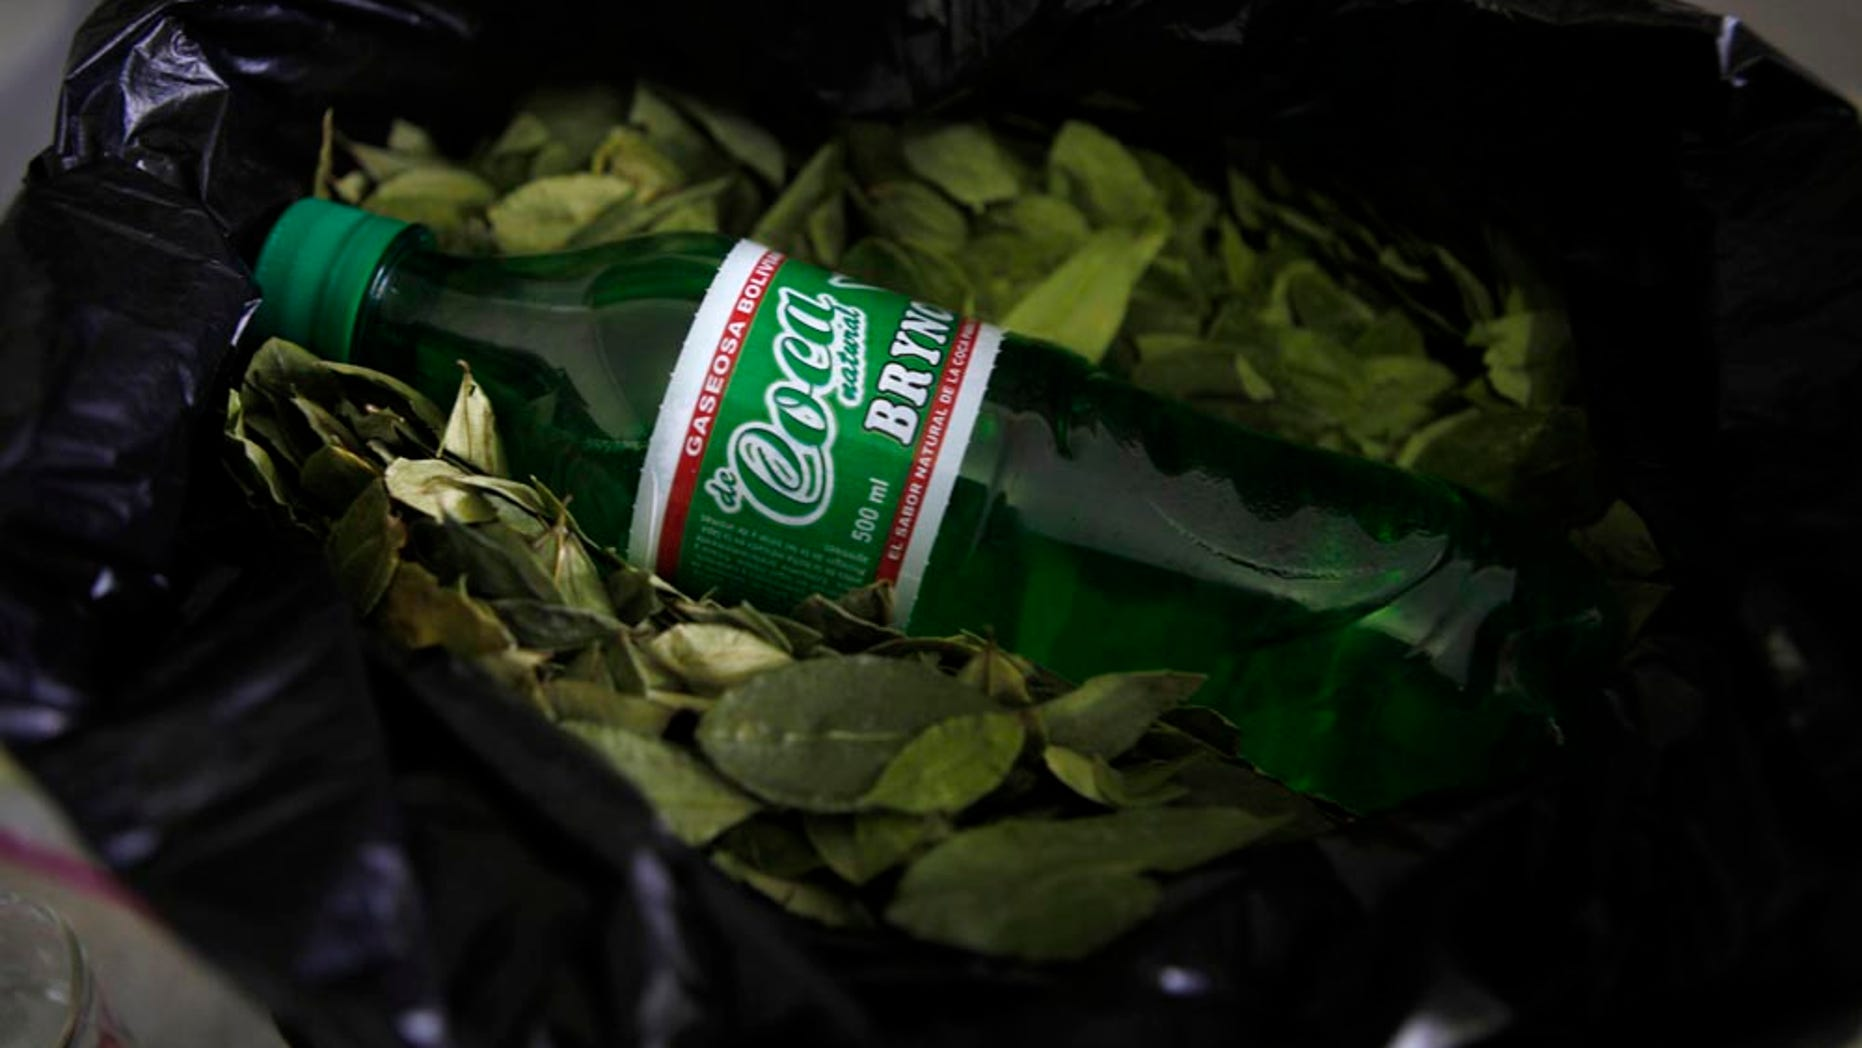 A bottle of Coca Brynco soda sits on display on top of coca leaves at the the Soda Pacena private soda company in El Alto, Bolivia, Friday Jan. 14, 2011.  Coca Brynco is a Bolivian soda made with coca leaves. (AP Photo/Juan Karita)